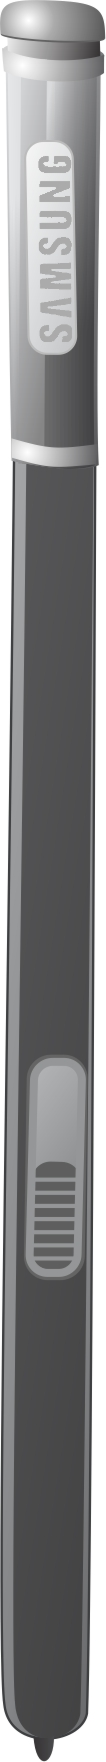 Samsung Note lapiz negro web